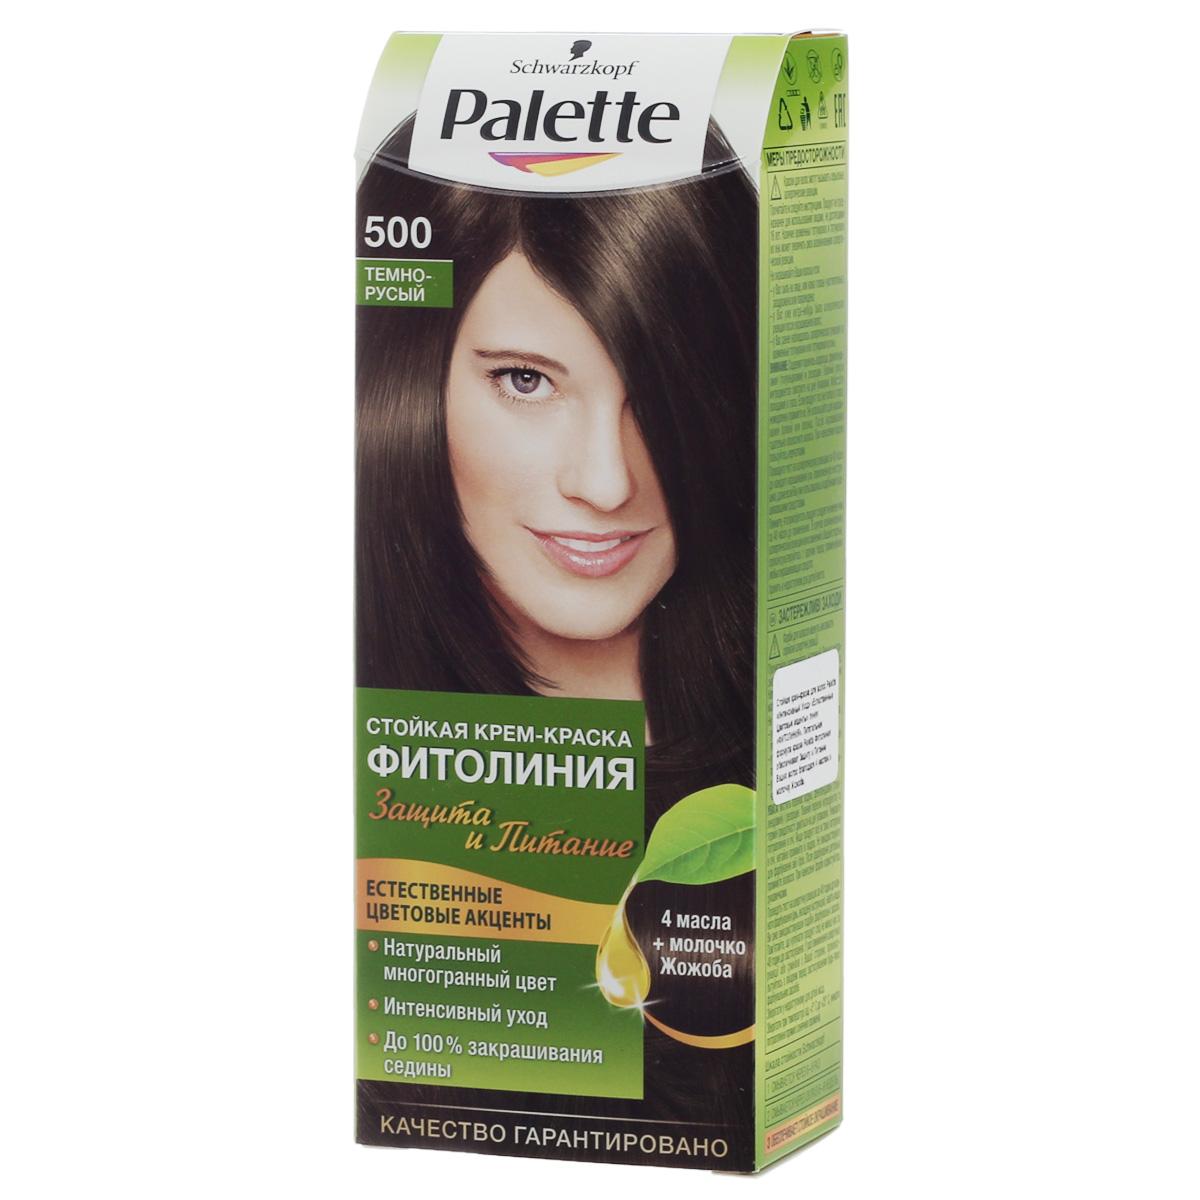 PALETTE Краска для волос ФИТОЛИНИЯ оттенок 500 Темно-русый, 110 мл